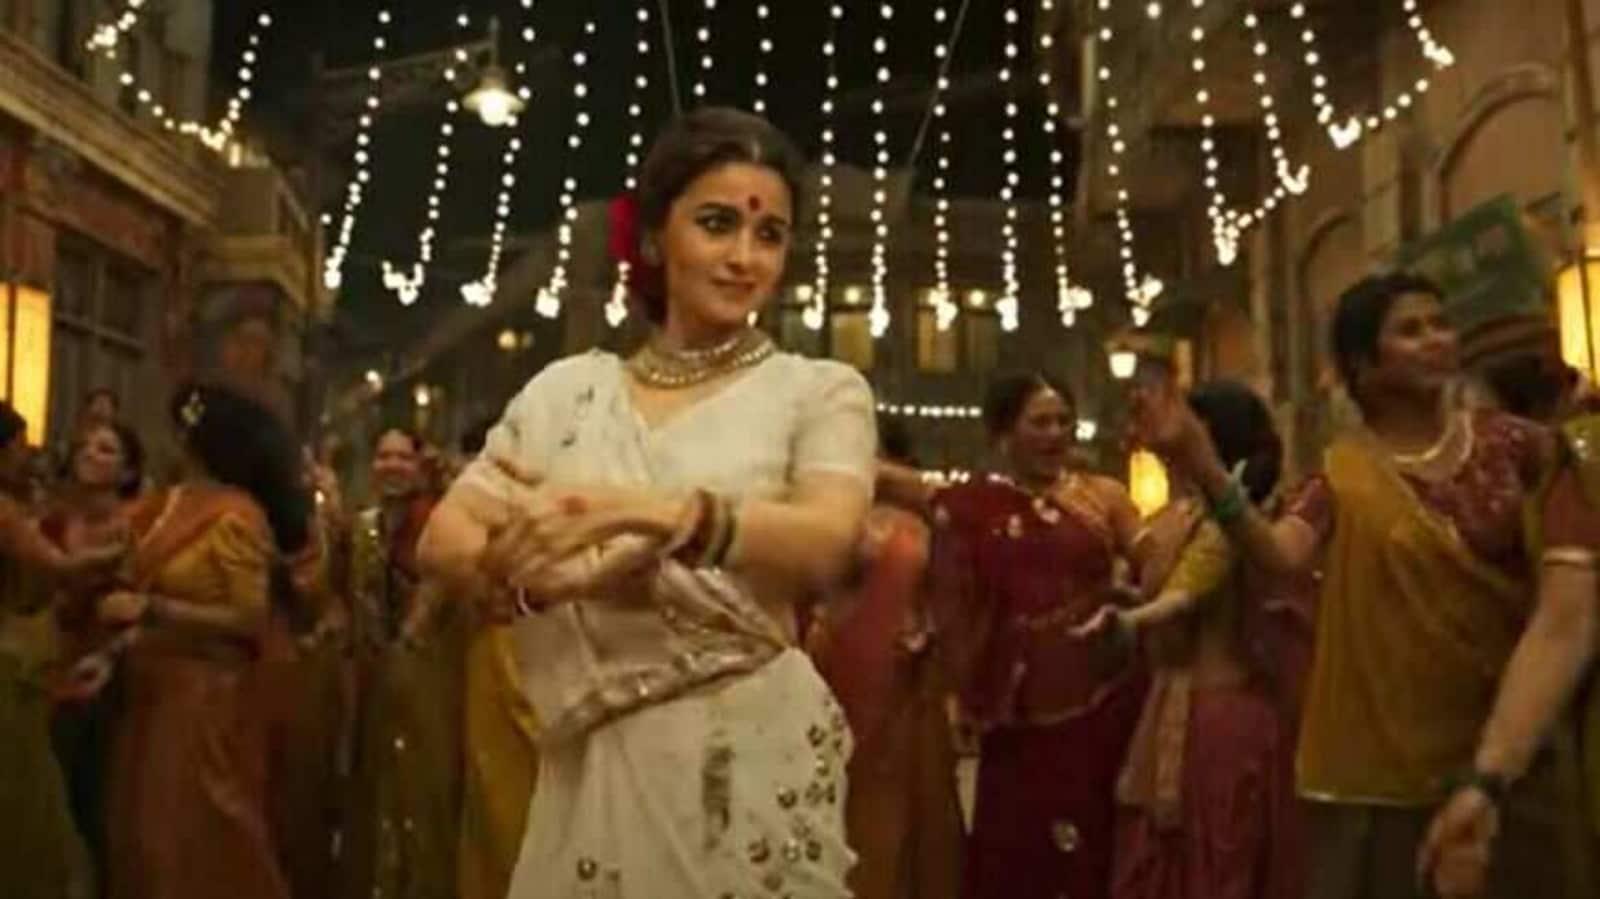 Gangubai Kathiawadi: Alia Bhatt wins praise, SS Rajamouli calls it 'impressive', Ram Charan says 'great screen presence' - Hindustan Times